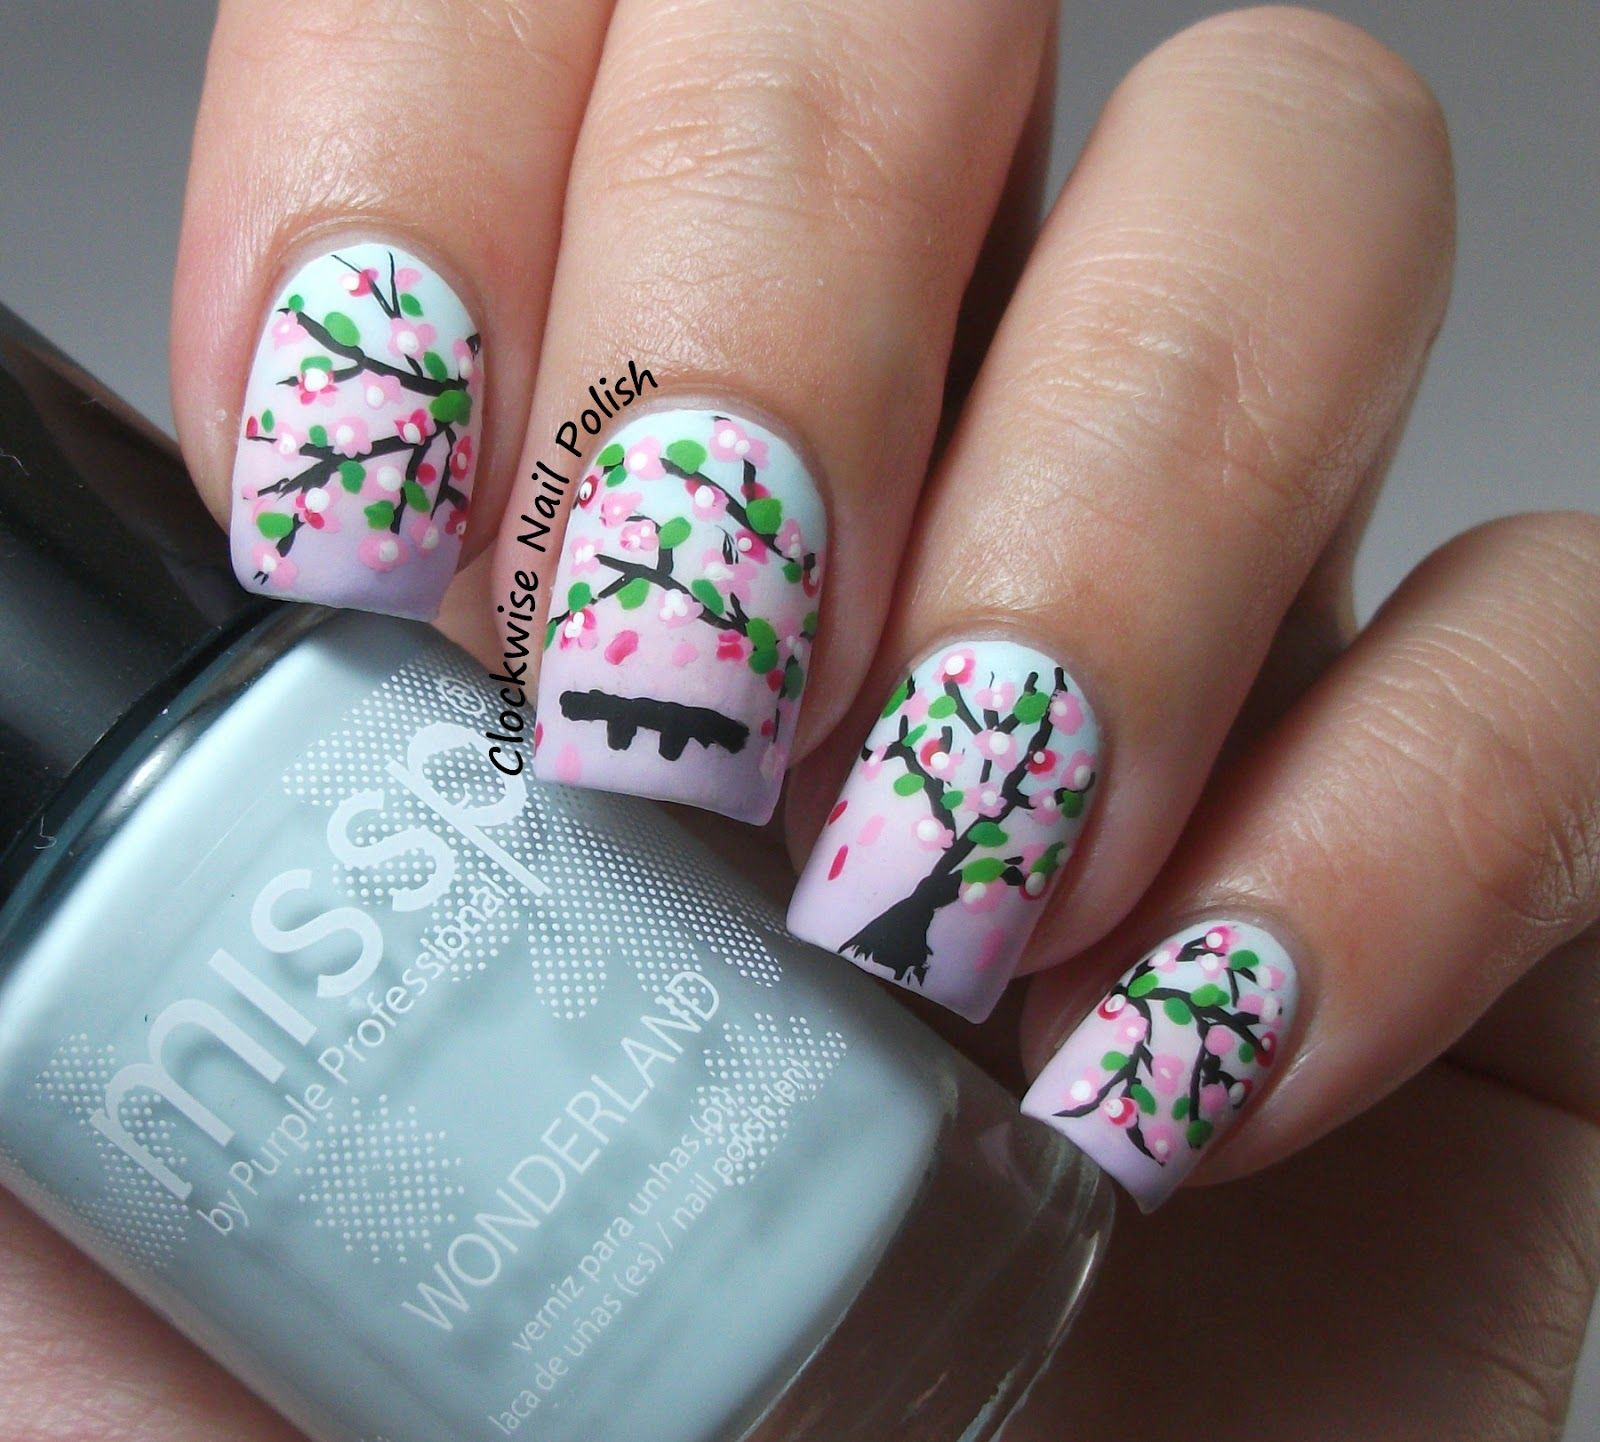 The Clockwise Nail Polish: Missp 10 Hope & Cherry Blossoms nail art ...